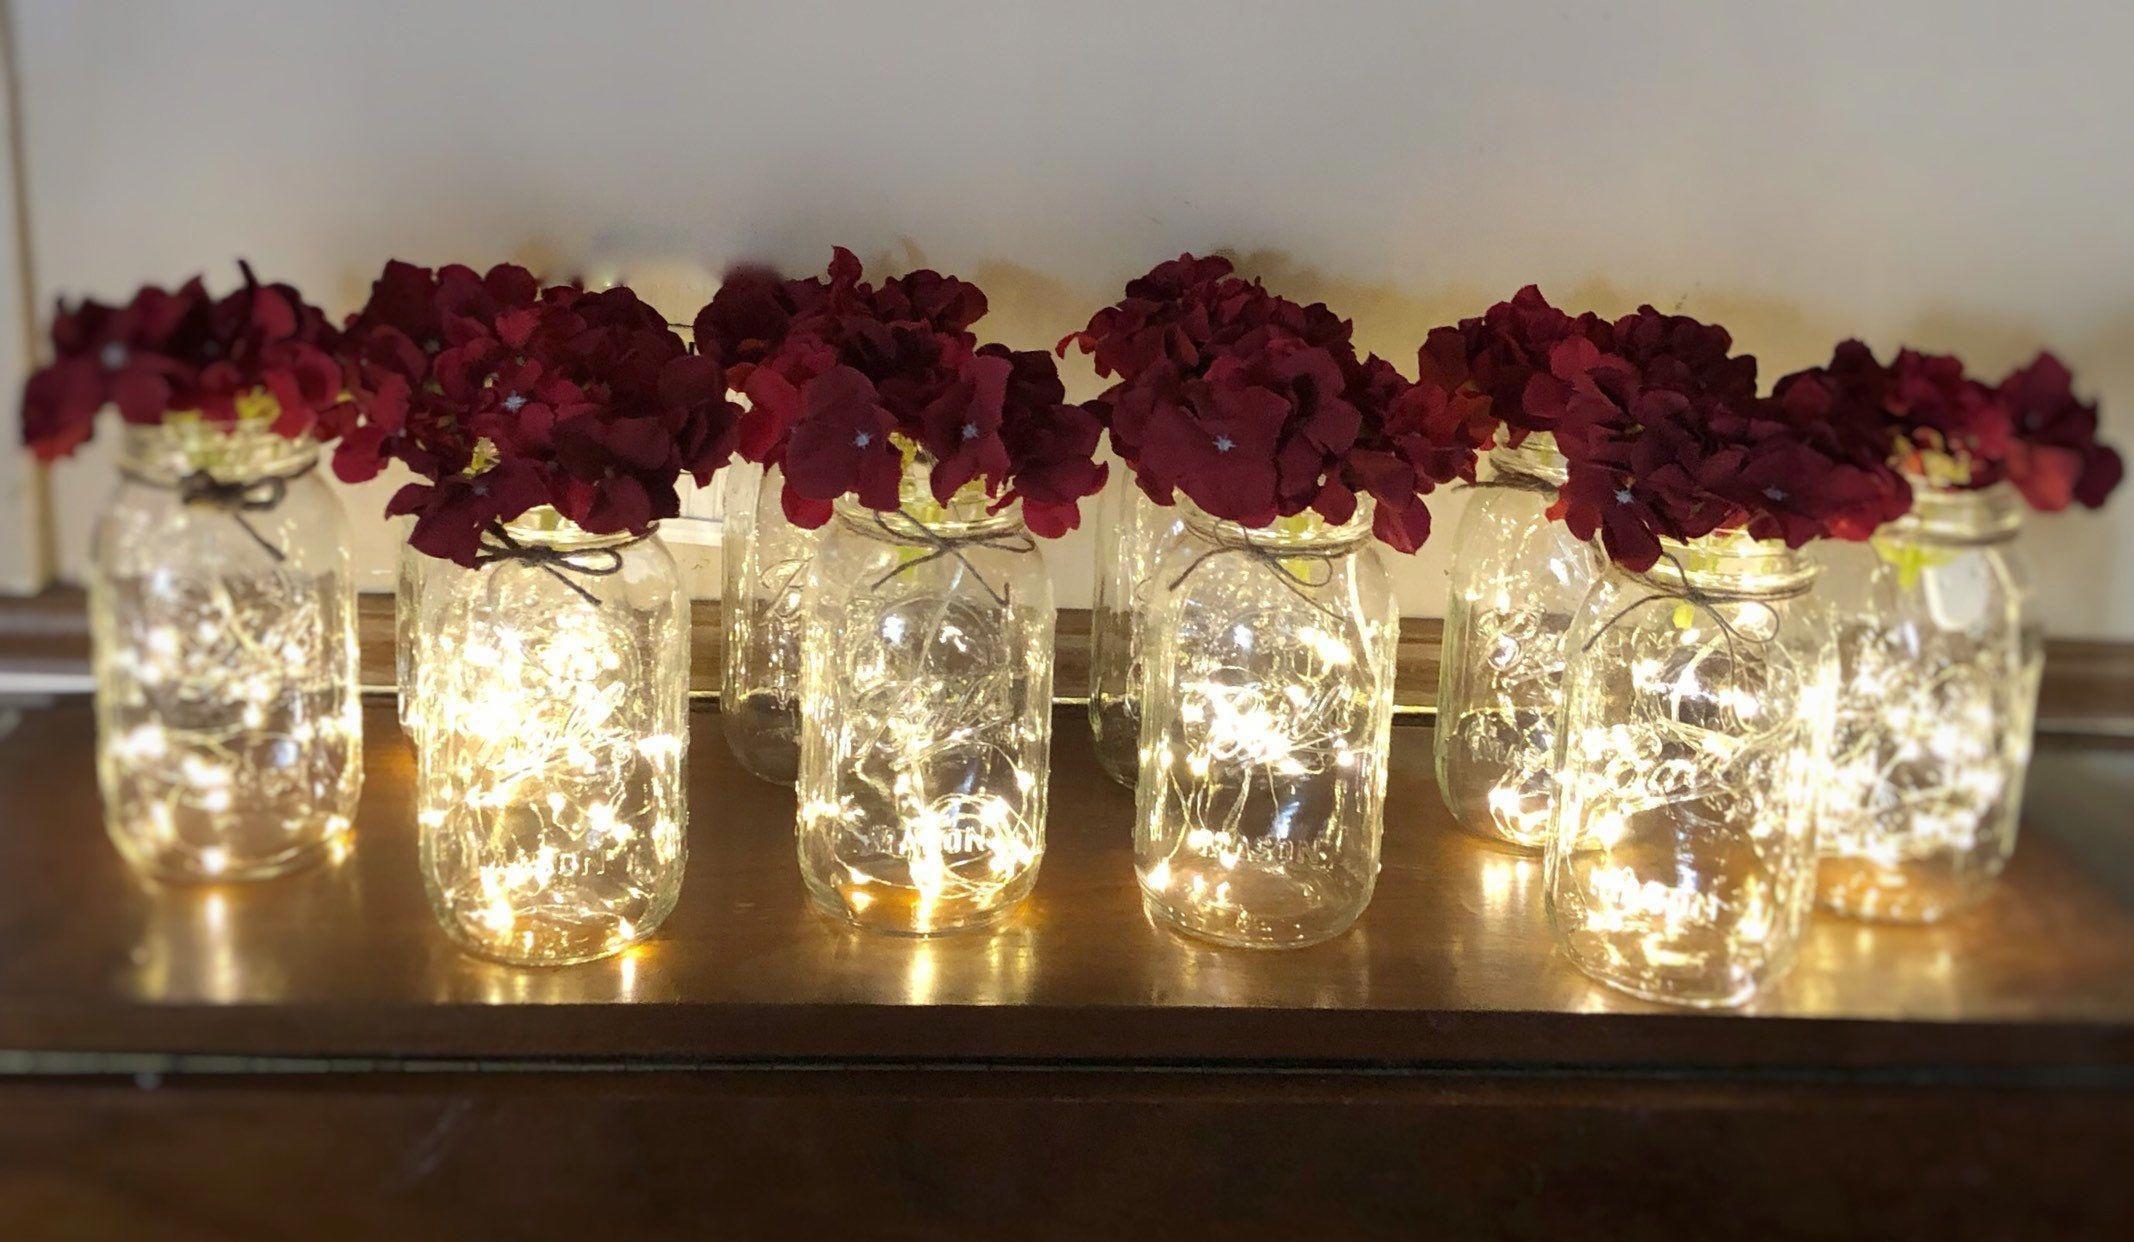 Romantic Wedding Bouquets Ideas Rustic Wedding Centerpieces Wedding Centerpieces Diy Country Party Decorations